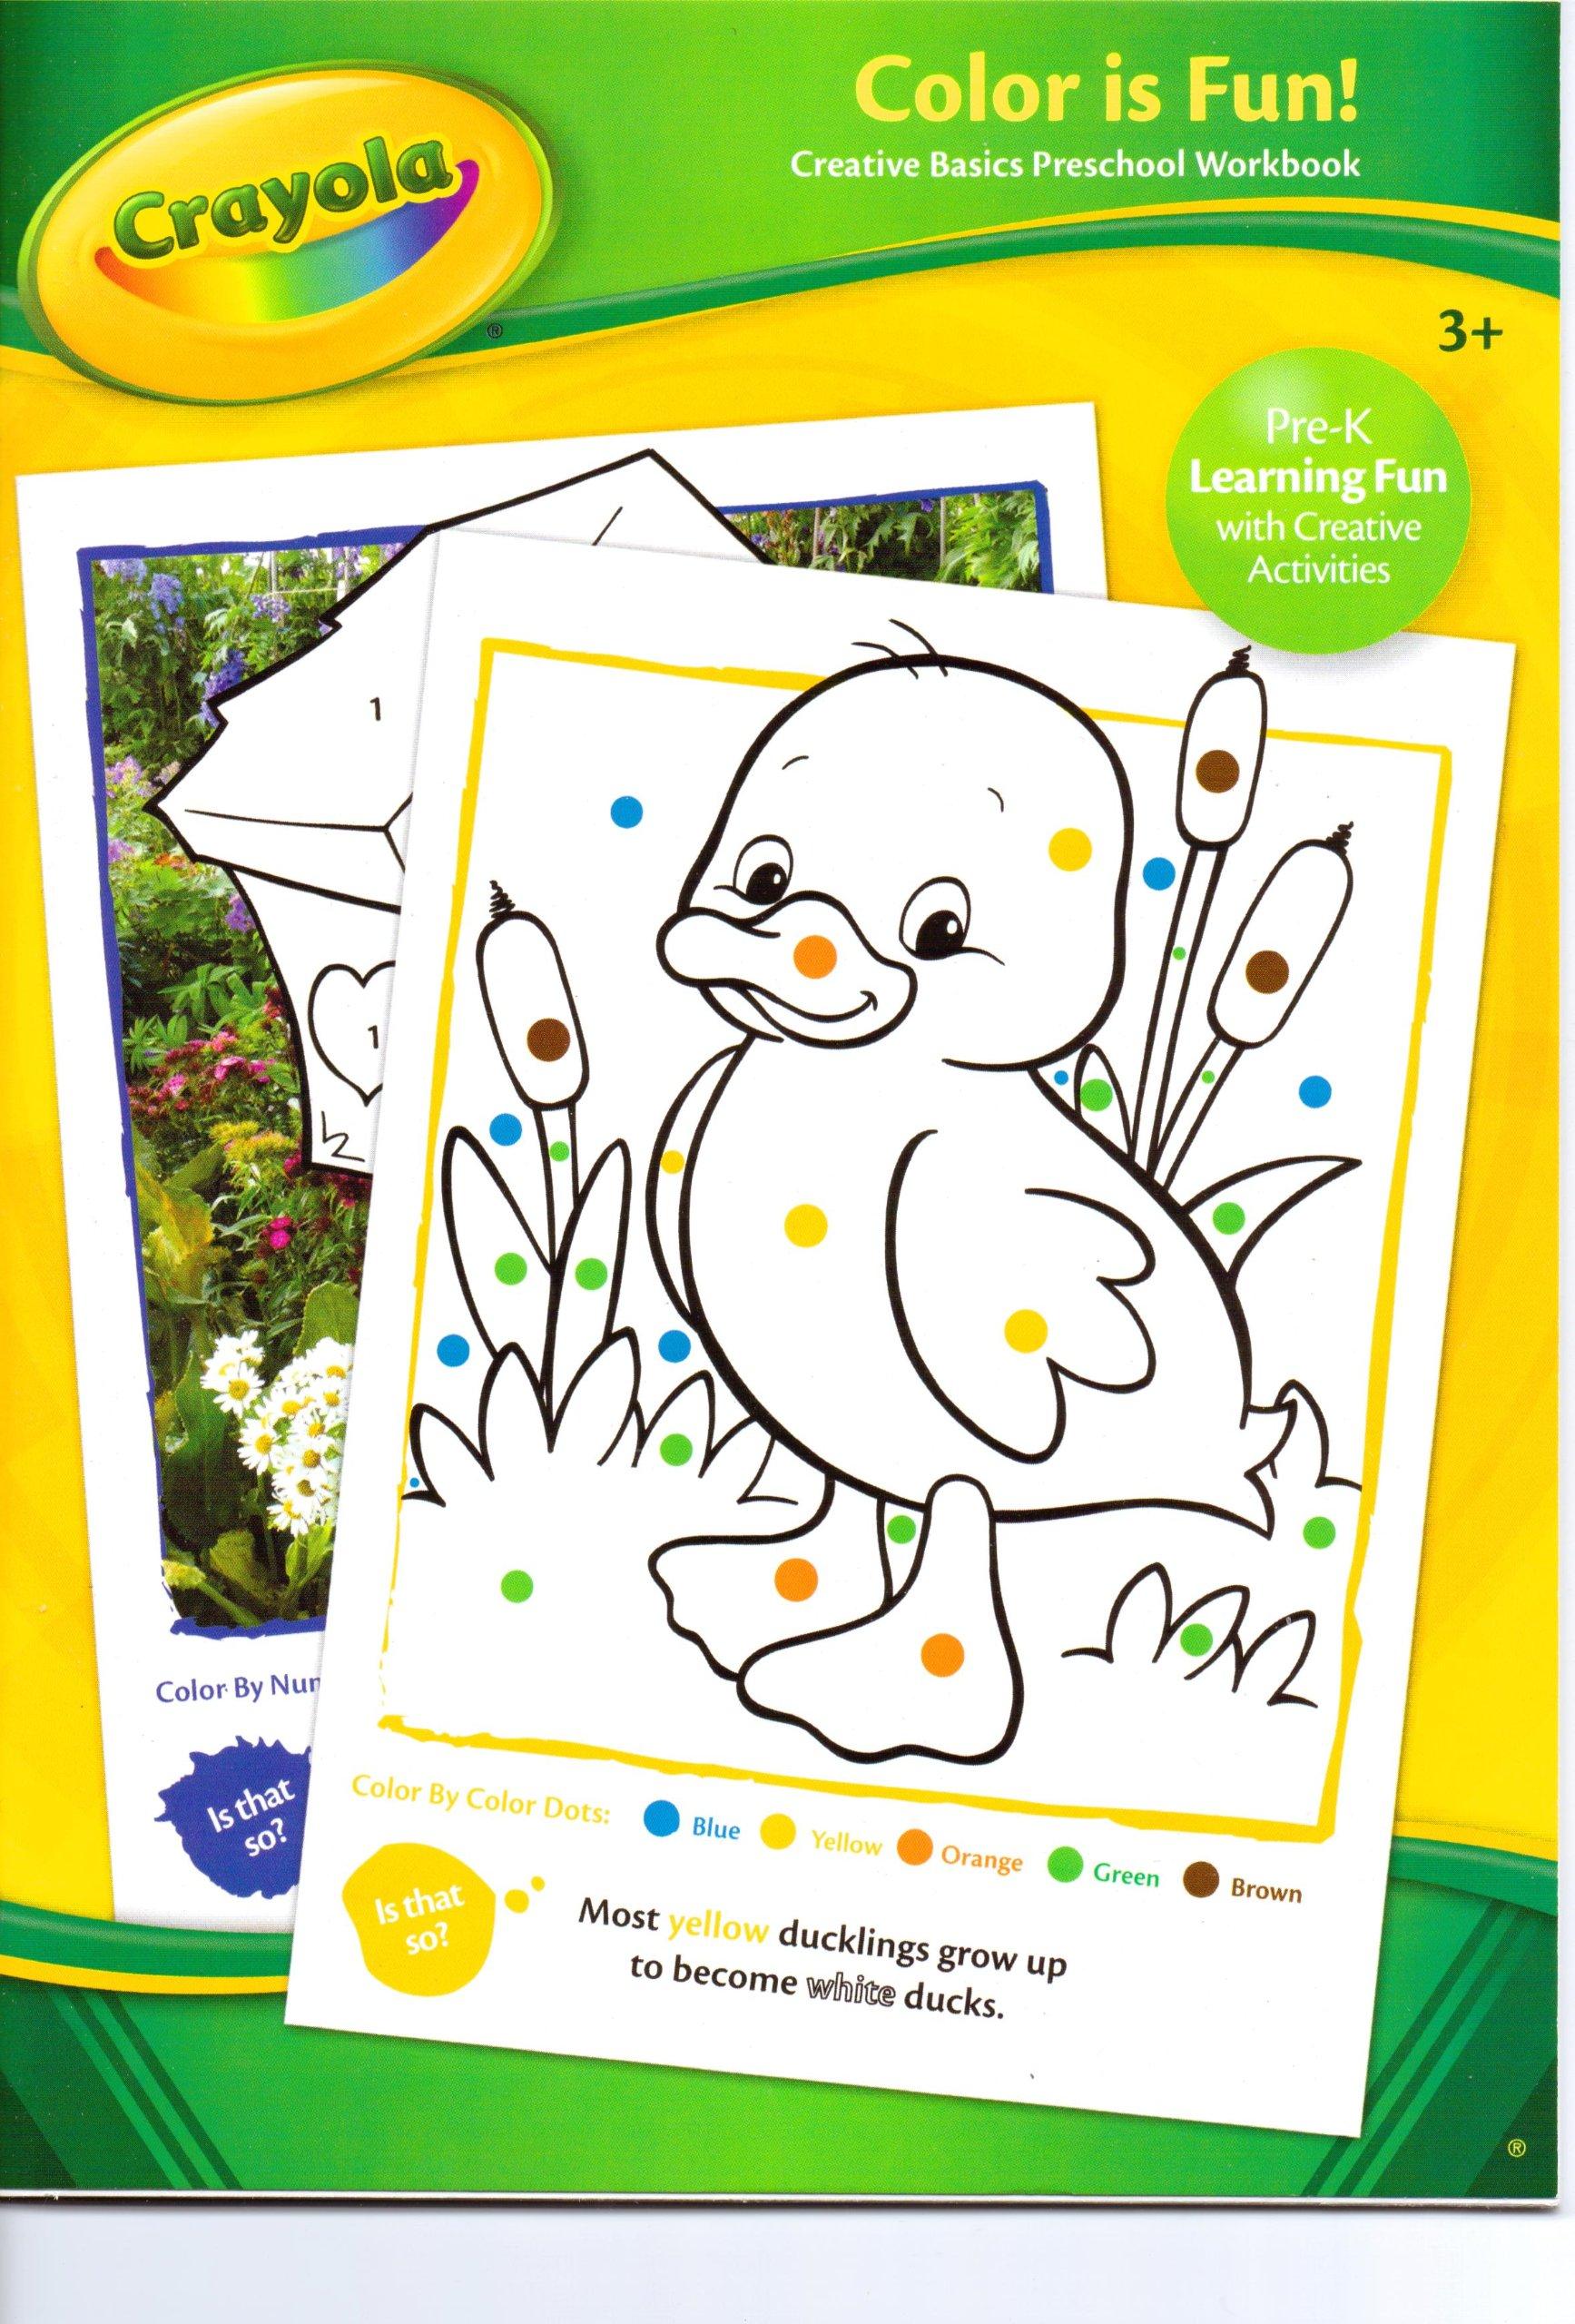 Crayola Color Is Fun! (Creative Basics Preschool Workbook): Crayola ...